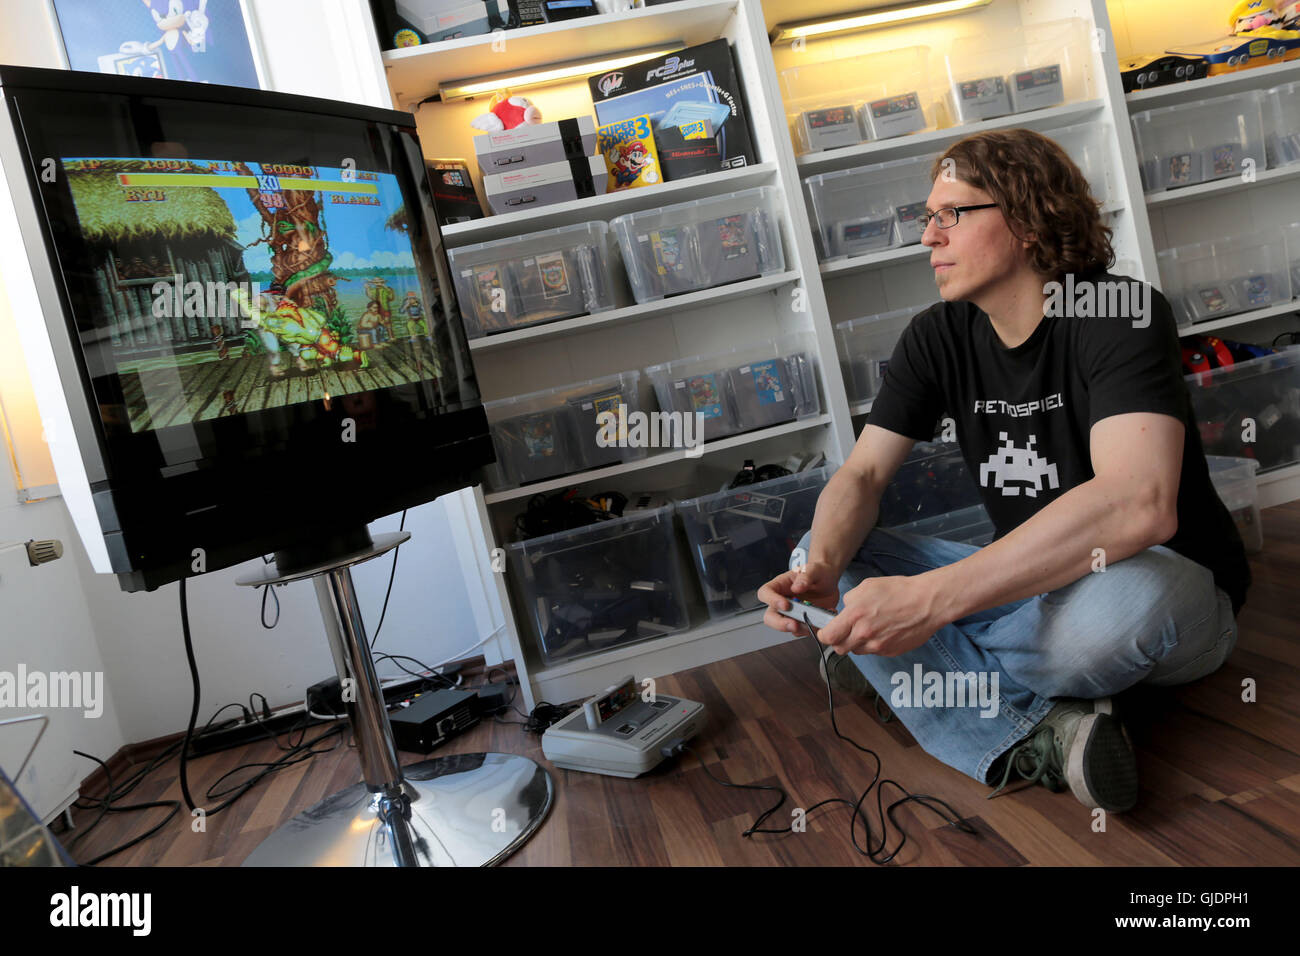 Retro Games Stock Photos & Retro Games Stock Images - Alamy